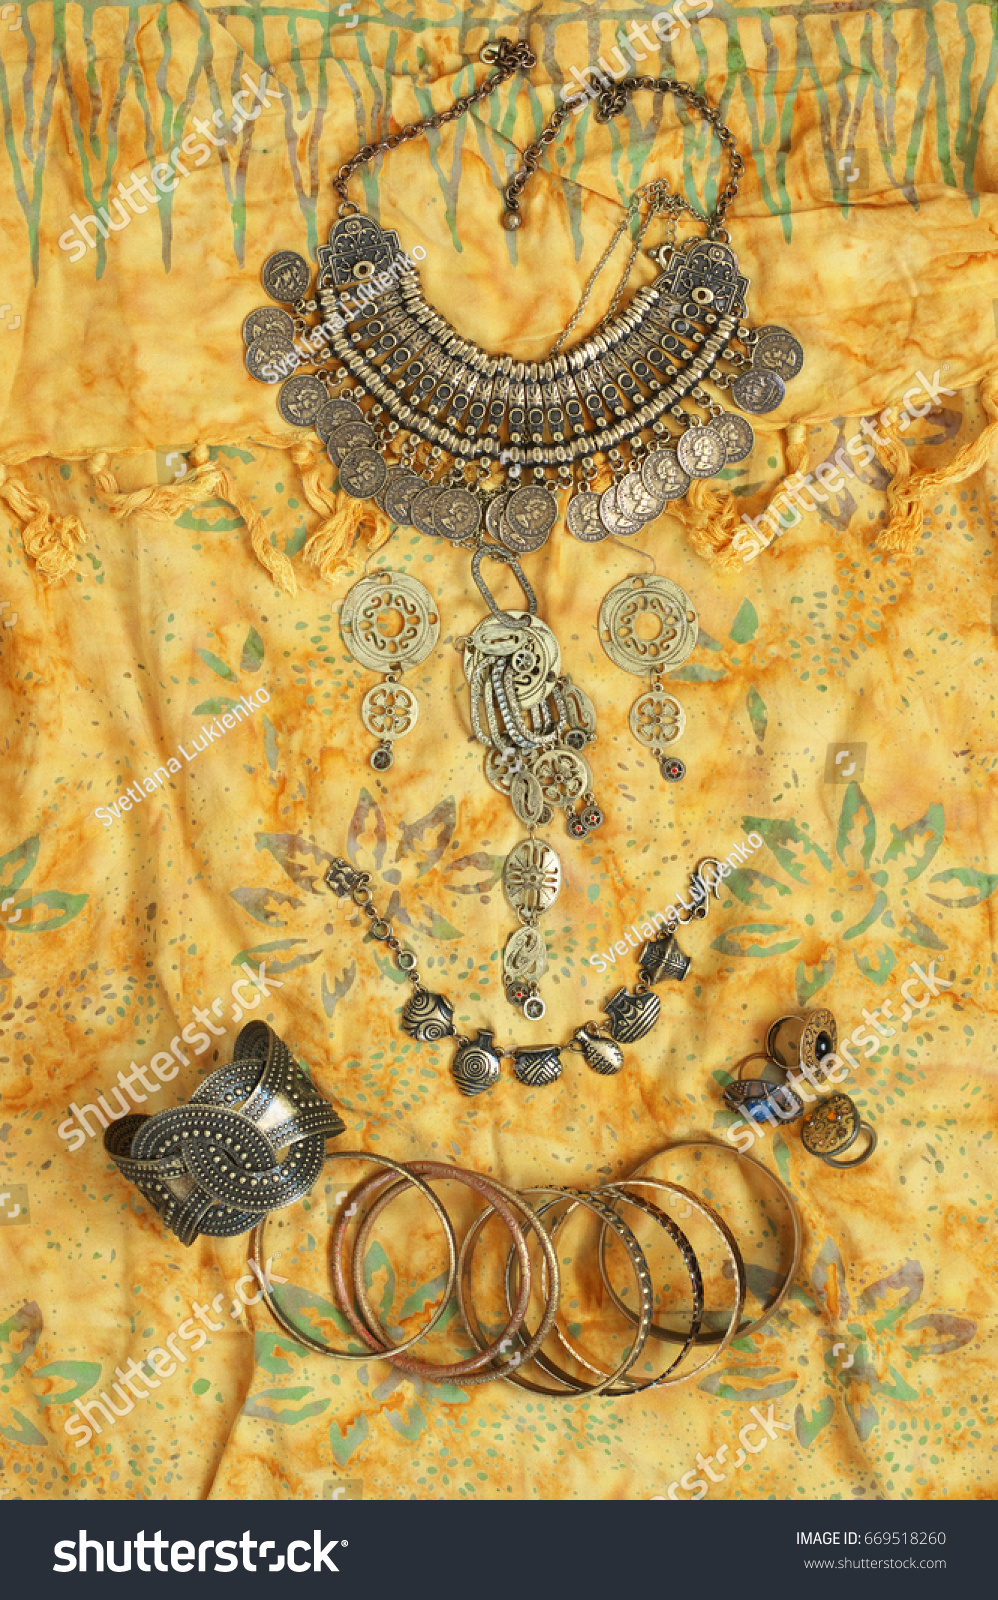 Bohemian Chic Bronze Jewelry Set On Stock Photo 669518260 - Shutterstock